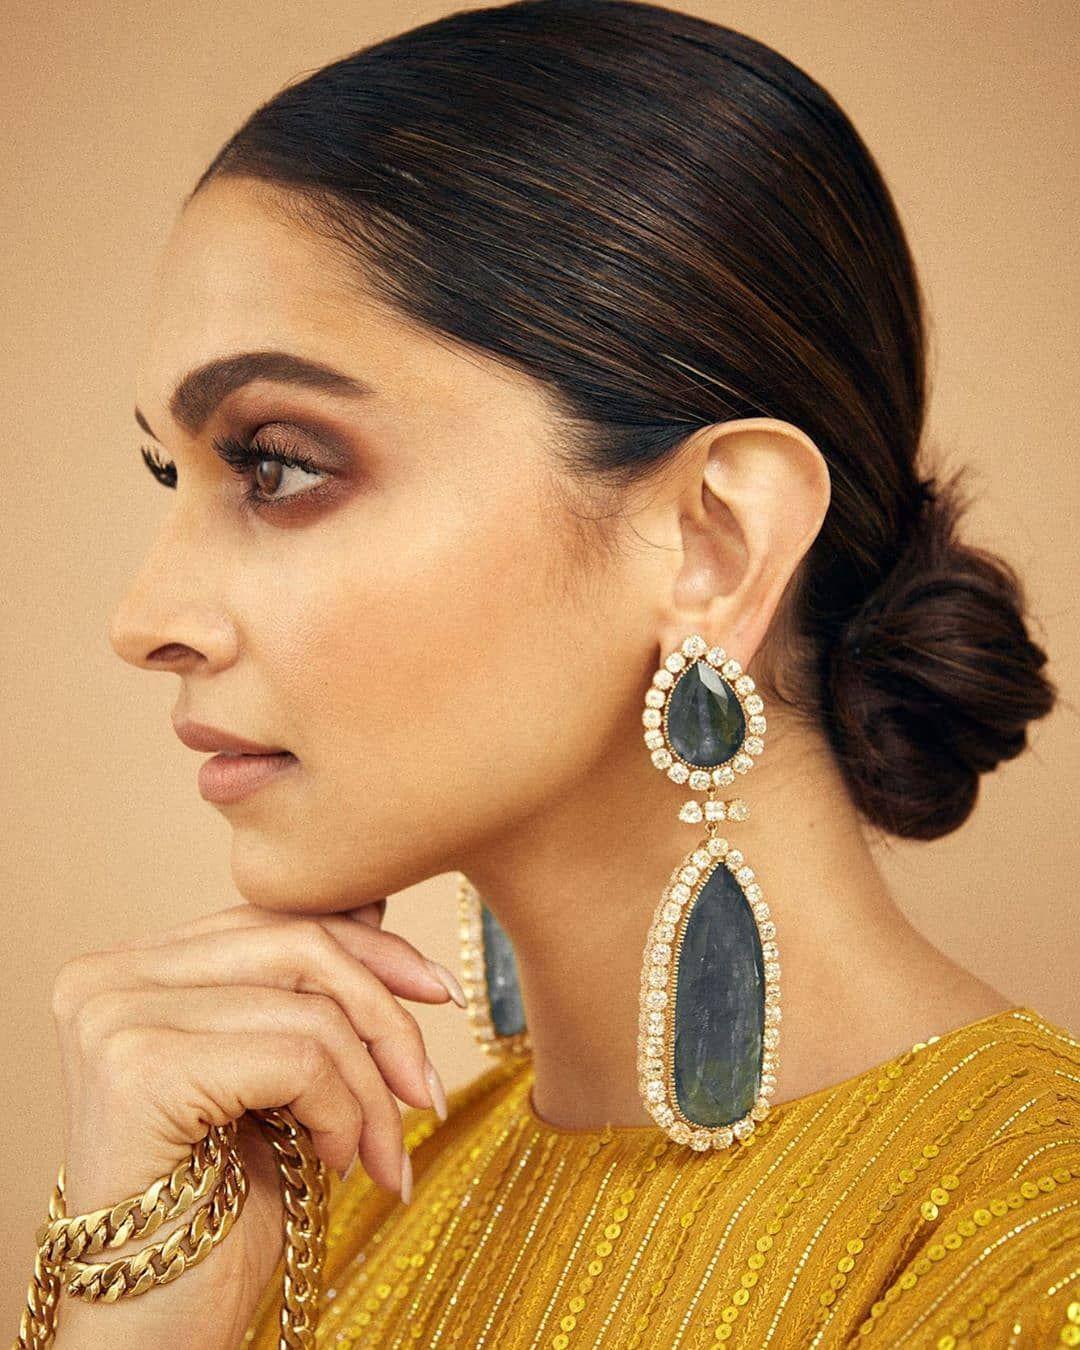 Deepika Padukone Personifies Elegance at Mumbai Press Club for Photographers Award - HungryBoo in 2020 | Deepika padukone style, Deepika padukone makeup, Deepika padukone